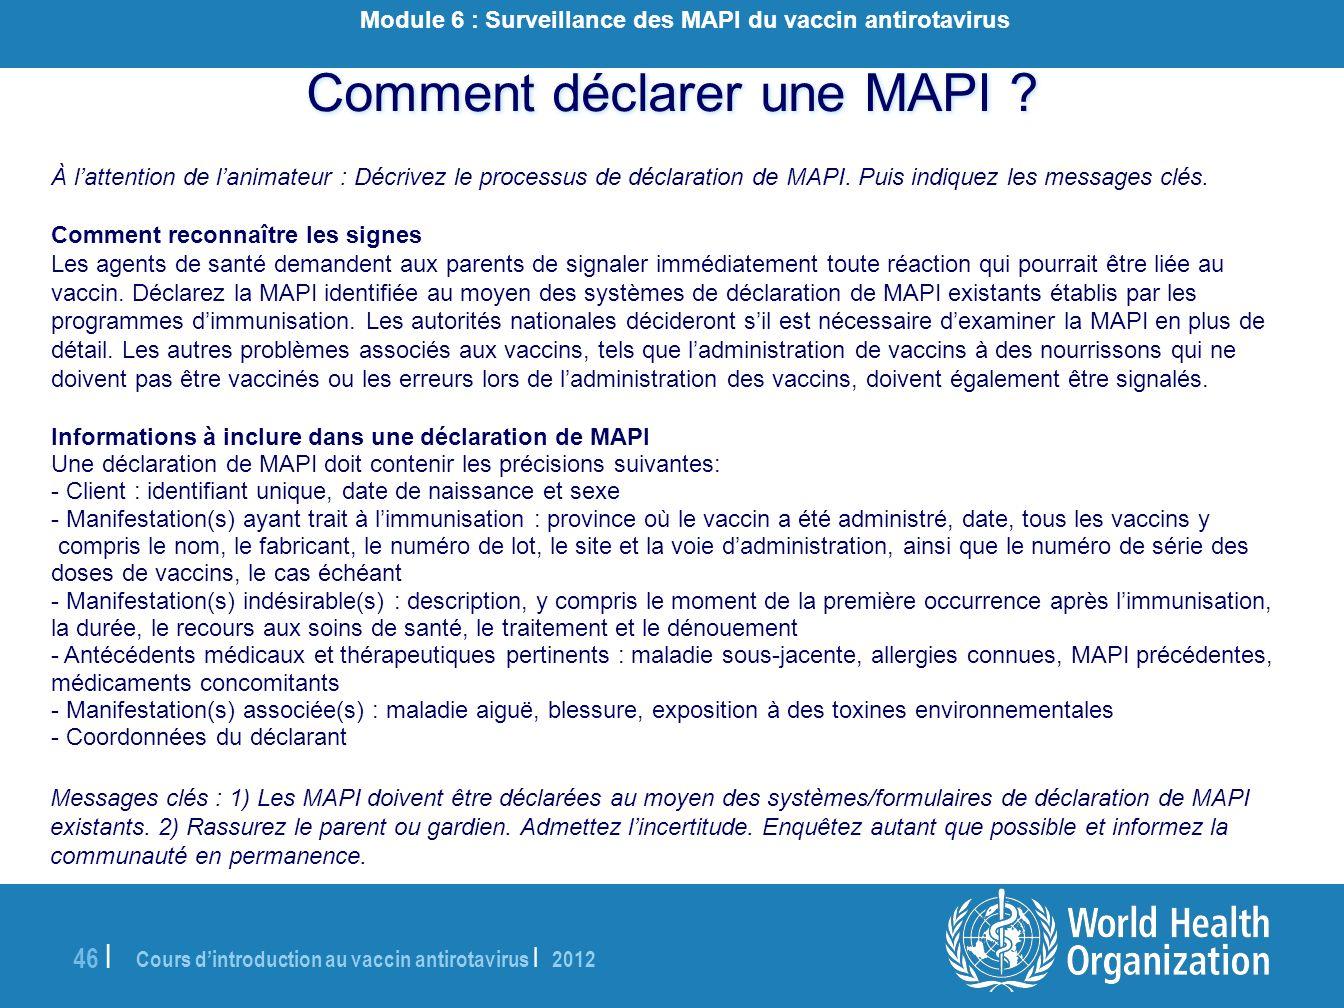 Module 6 : Surveillance des MAPI du vaccin antirotavirus